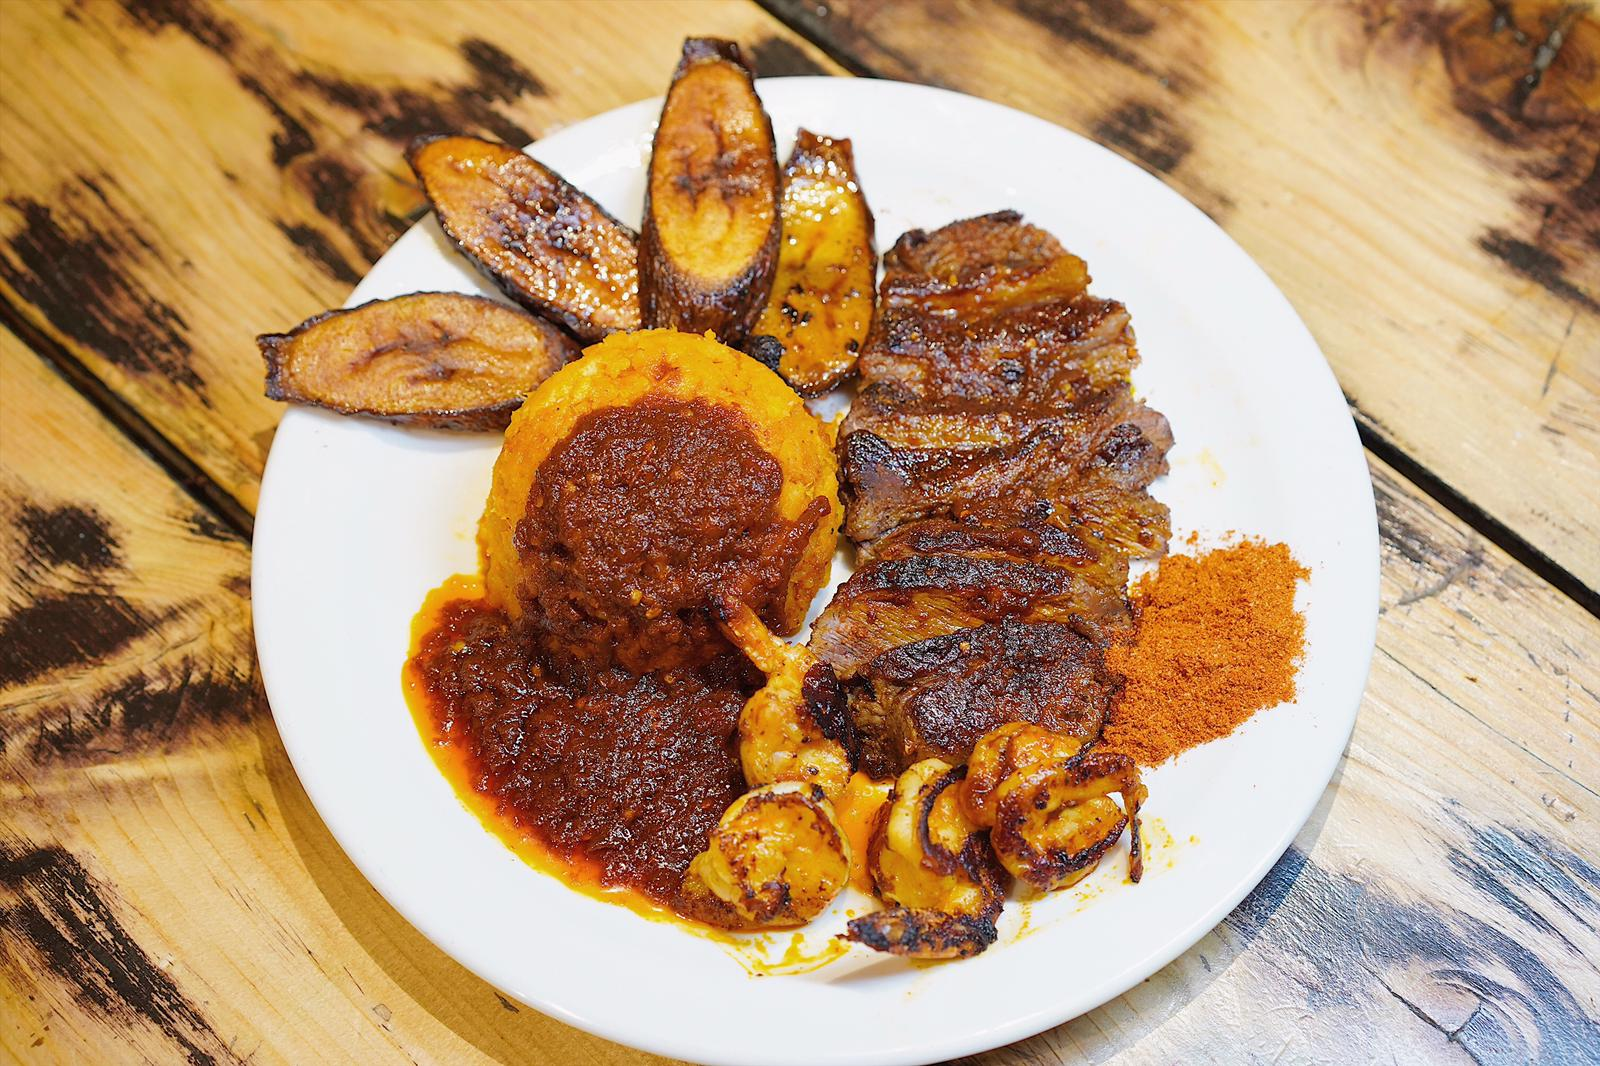 Suya Surf & Turf - A delicious Nigerian dish of suya spiced rump steak, suya grilled prawns, asaro, eaw agoyin sauce, pottage and fried plantain